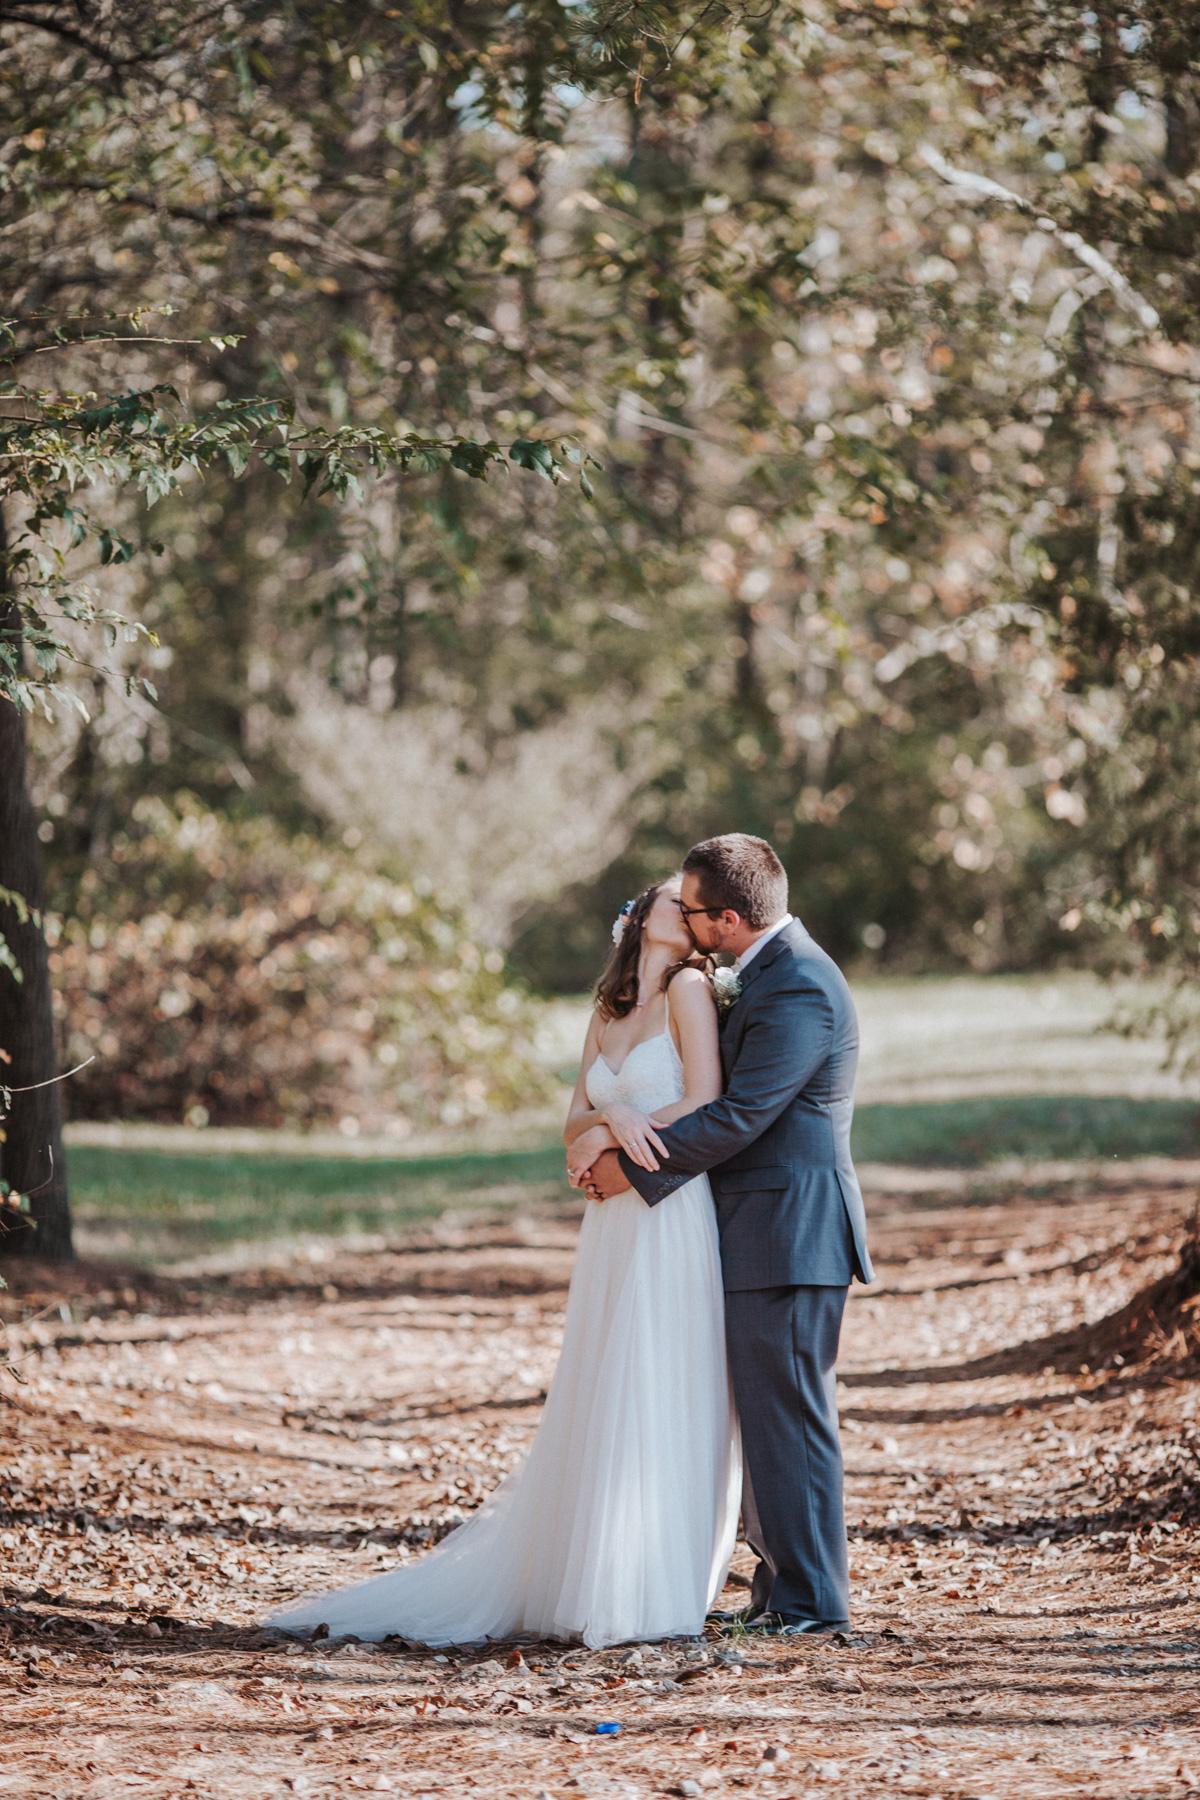 Bride and Groom Fall Wedding Photography by Greensboro Winston-Salem Photographer   Kayli LaFon Photography